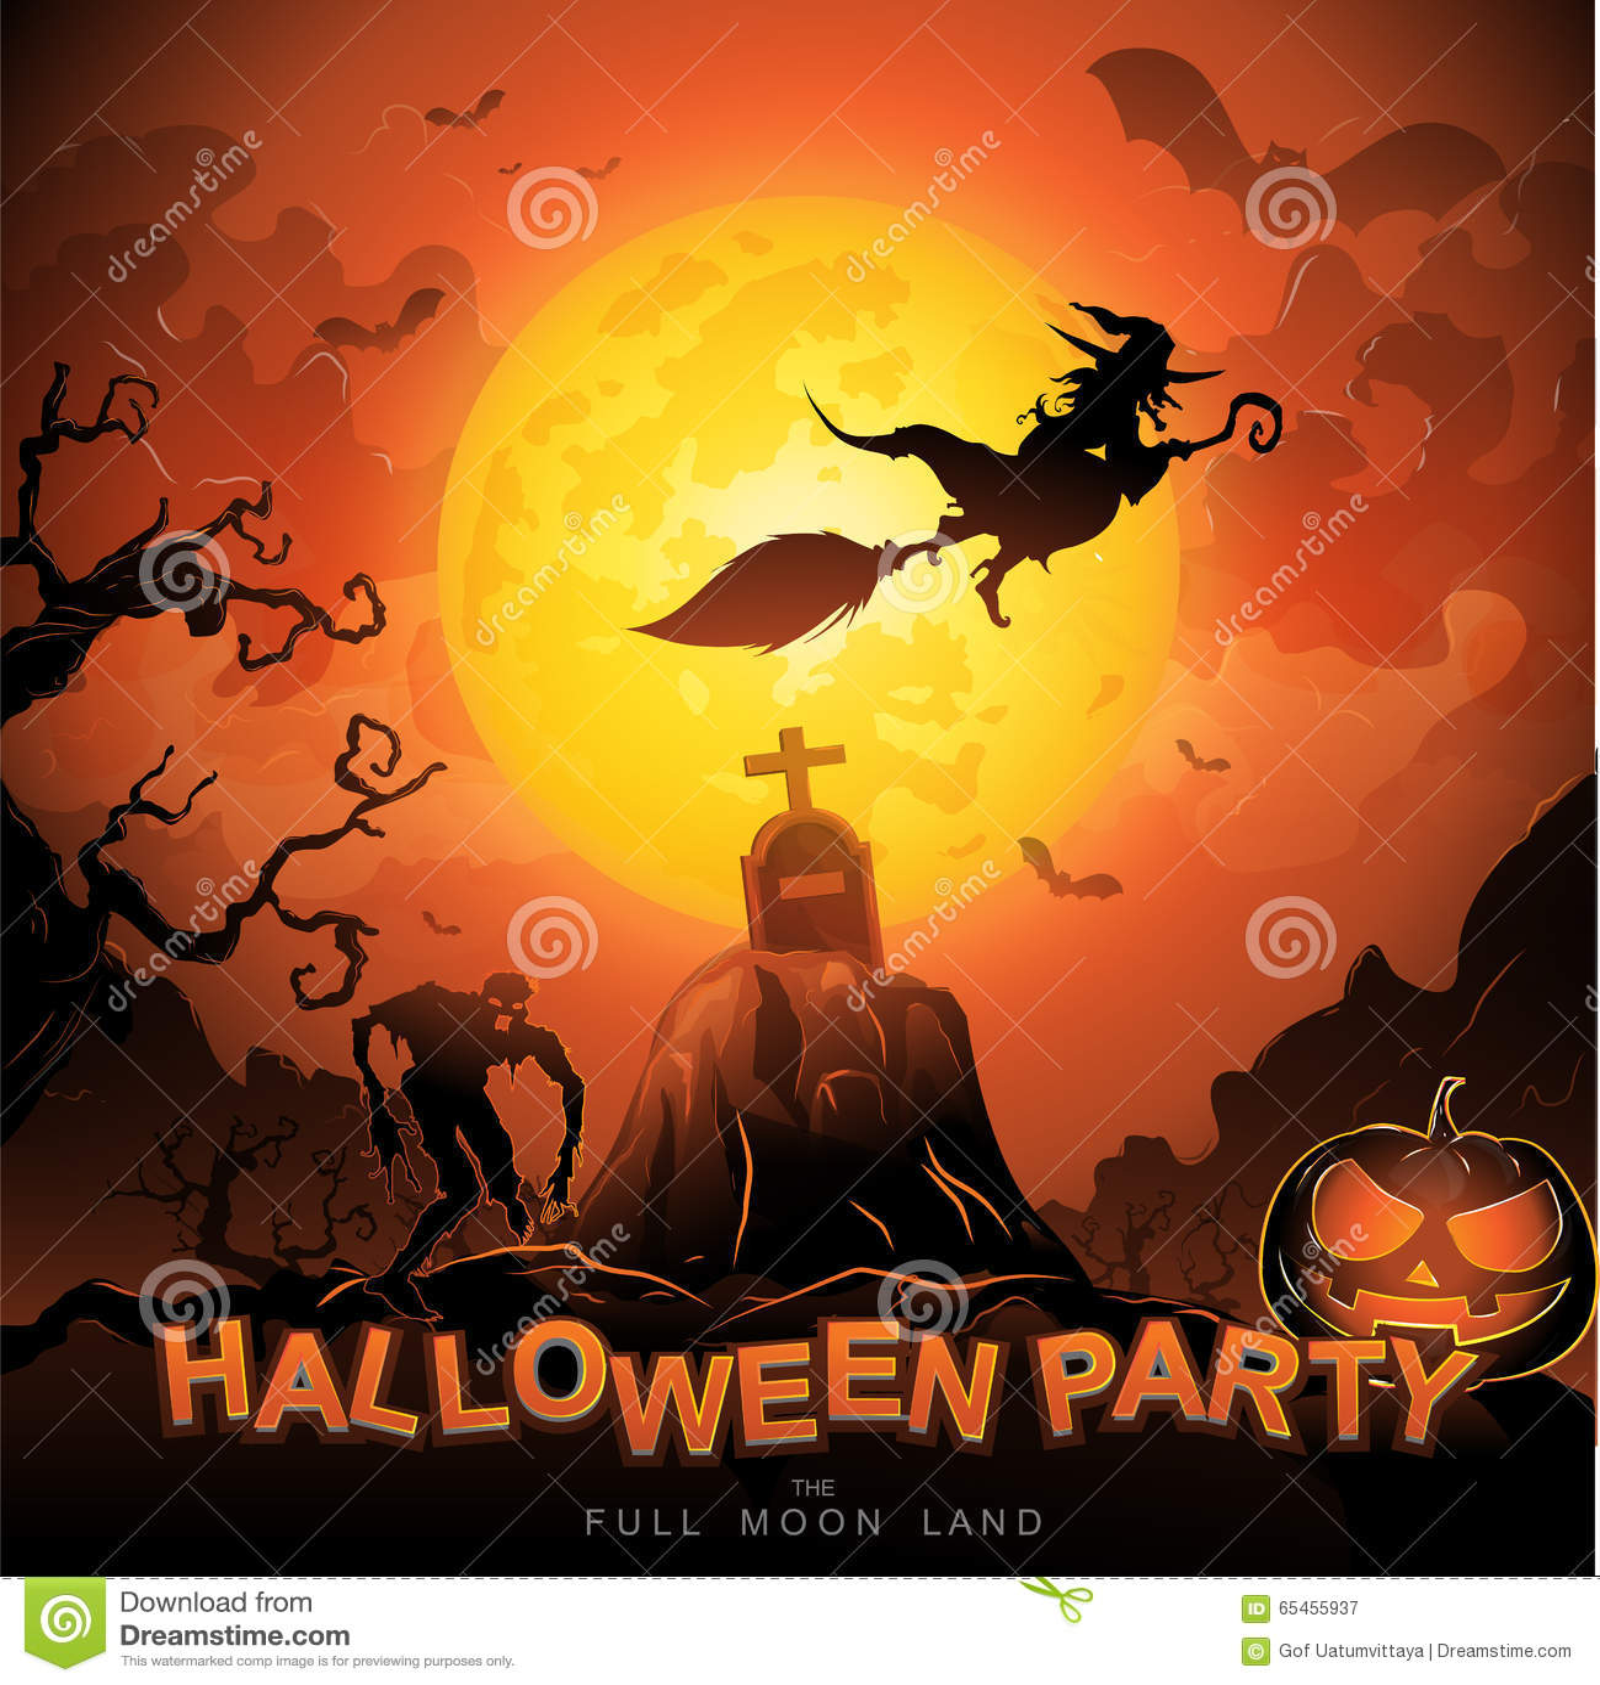 Halloween Party Vector Concept Full Moon Land Stock Vector - Image ...